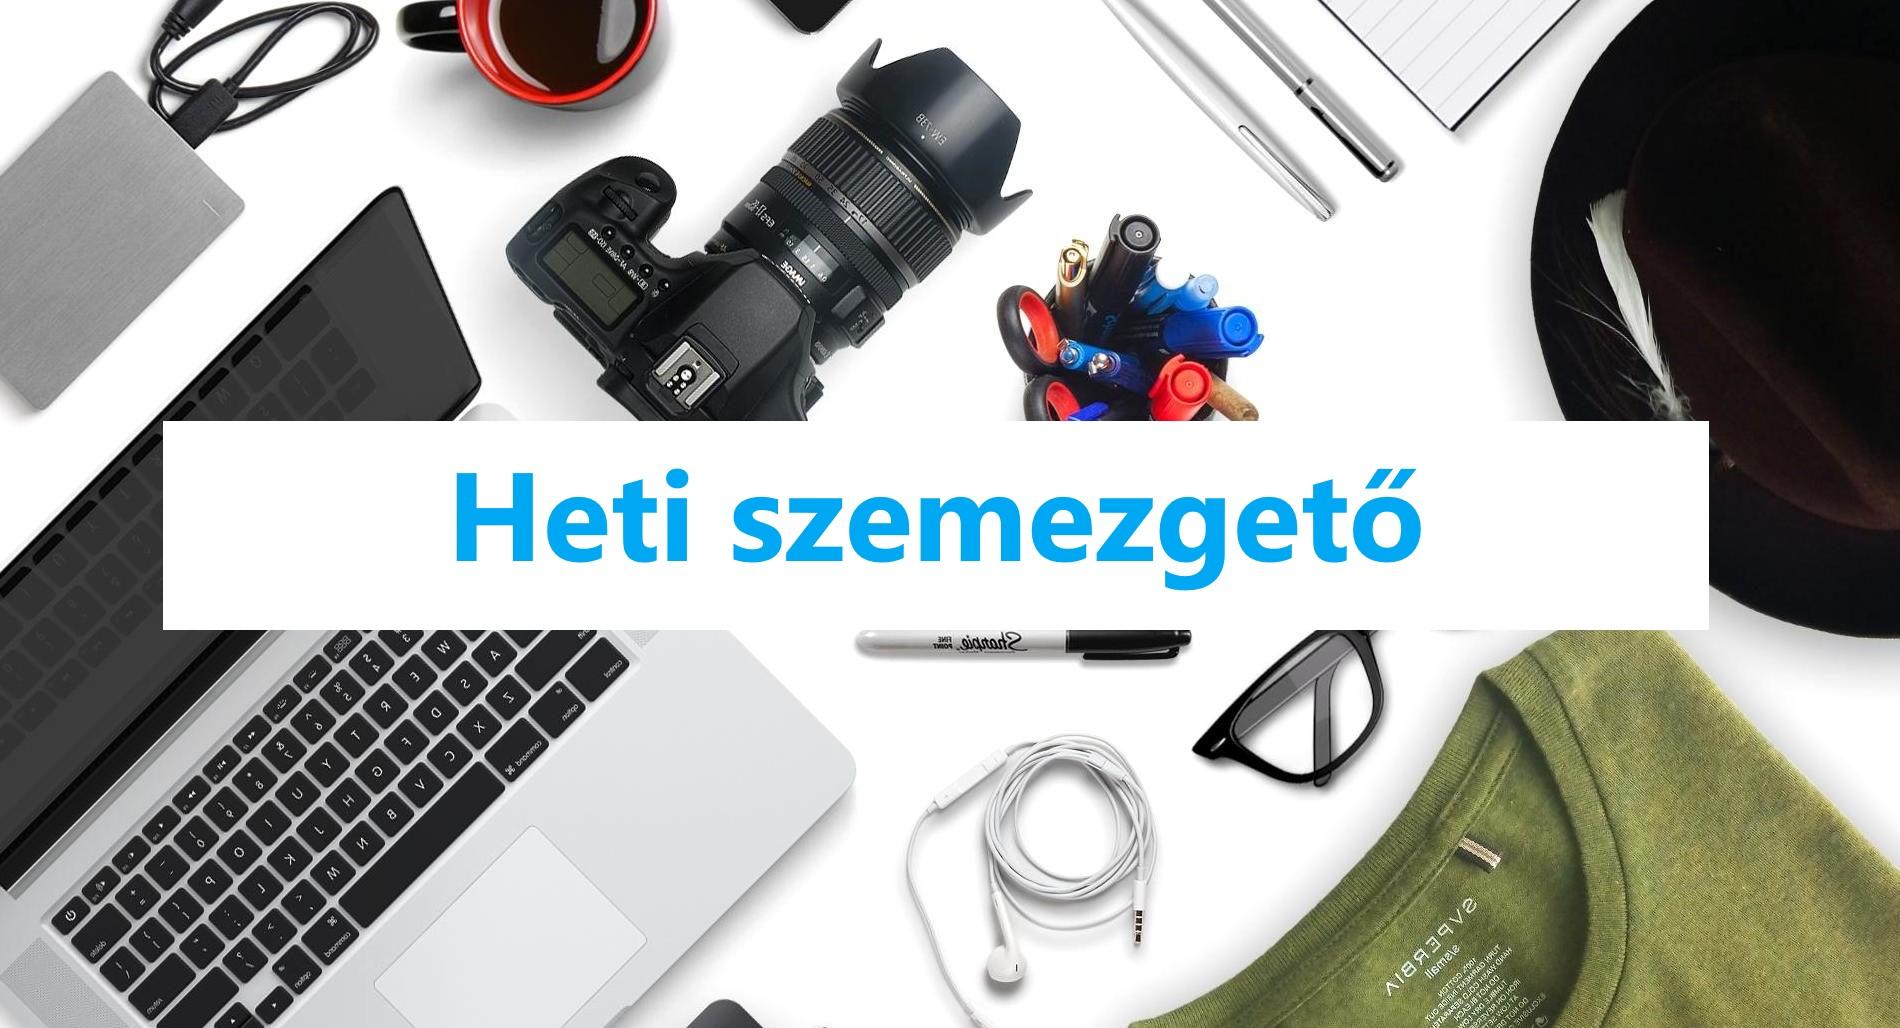 heti_szemezgeto_uj_76.jpg